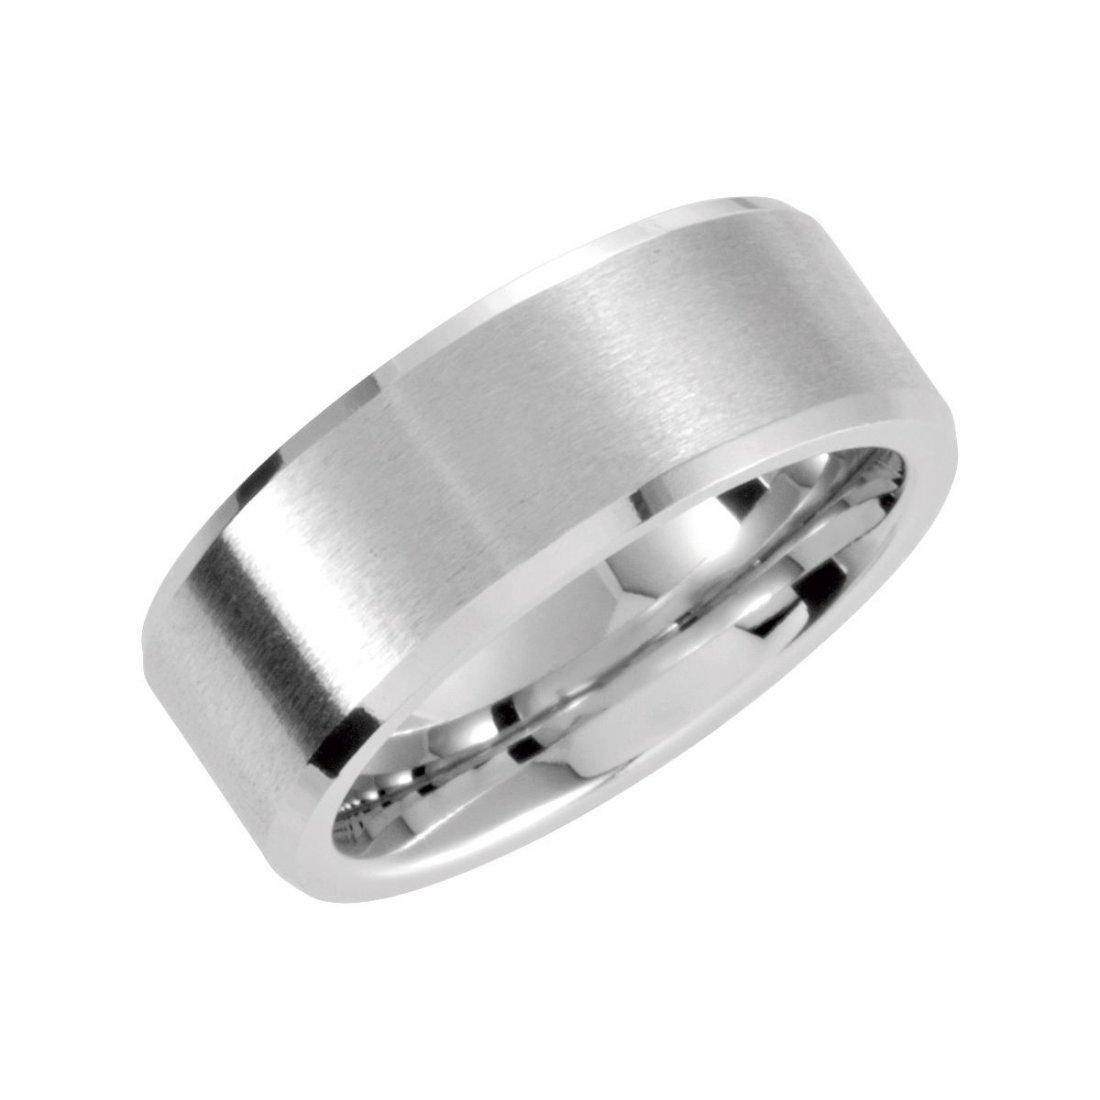 Ring - Cobalt 8mm Rounded Satin & Polished Band Size